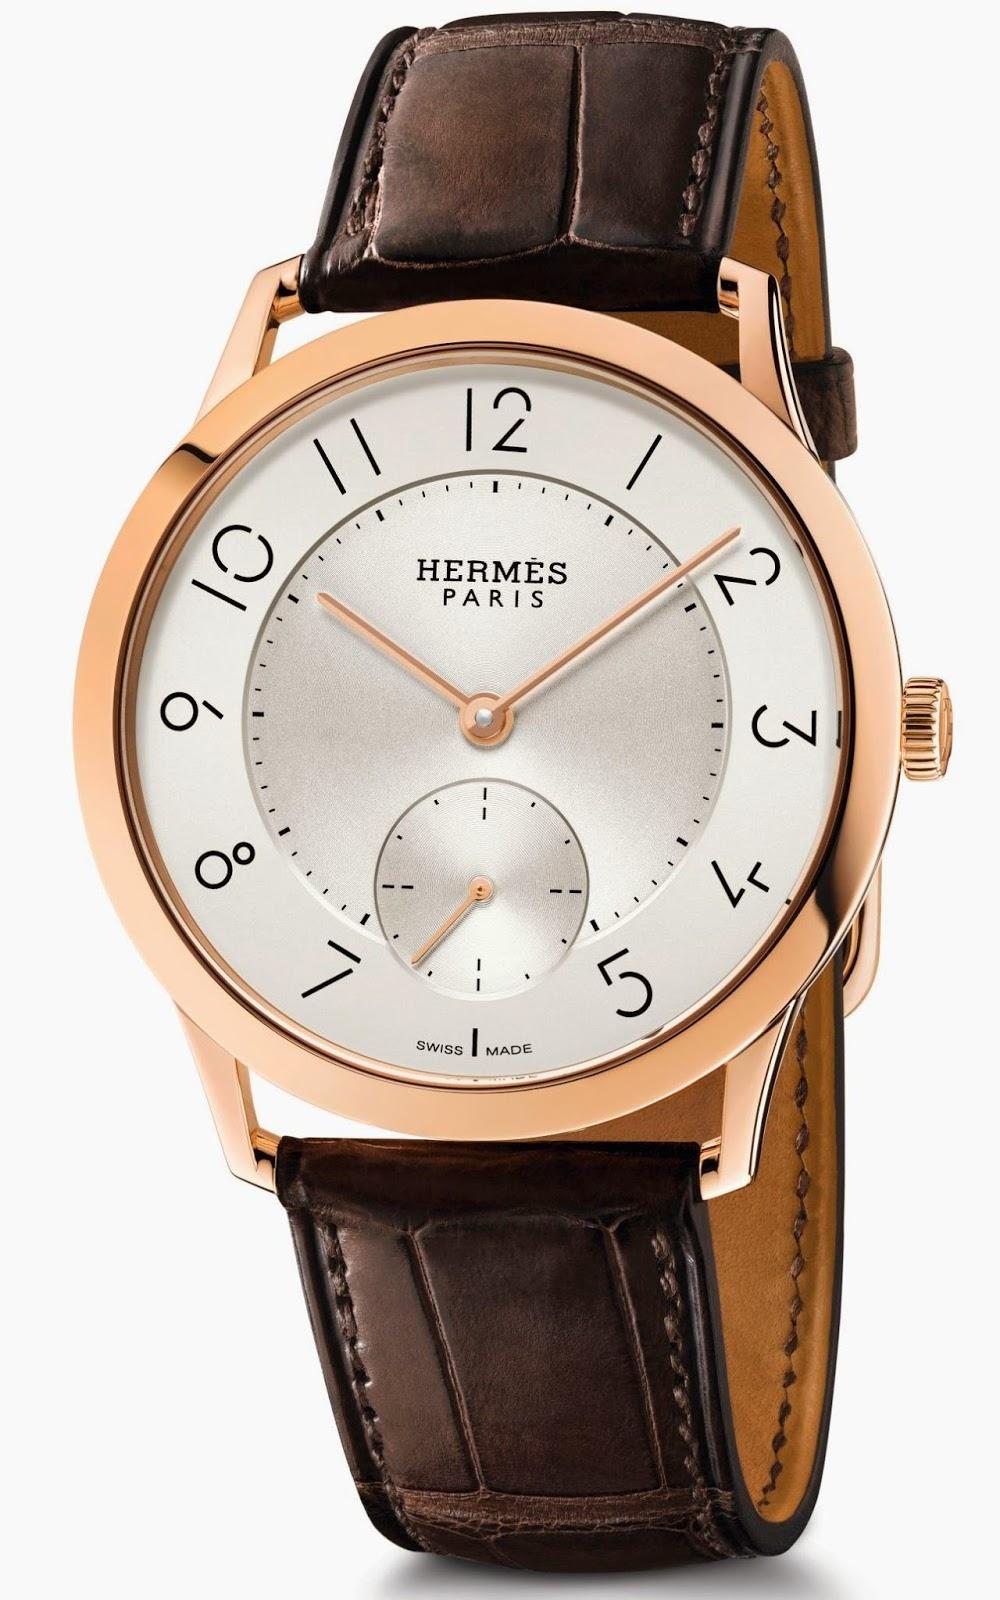 Hermès - Slim d'Hermès Petite Seconds Automatic watch